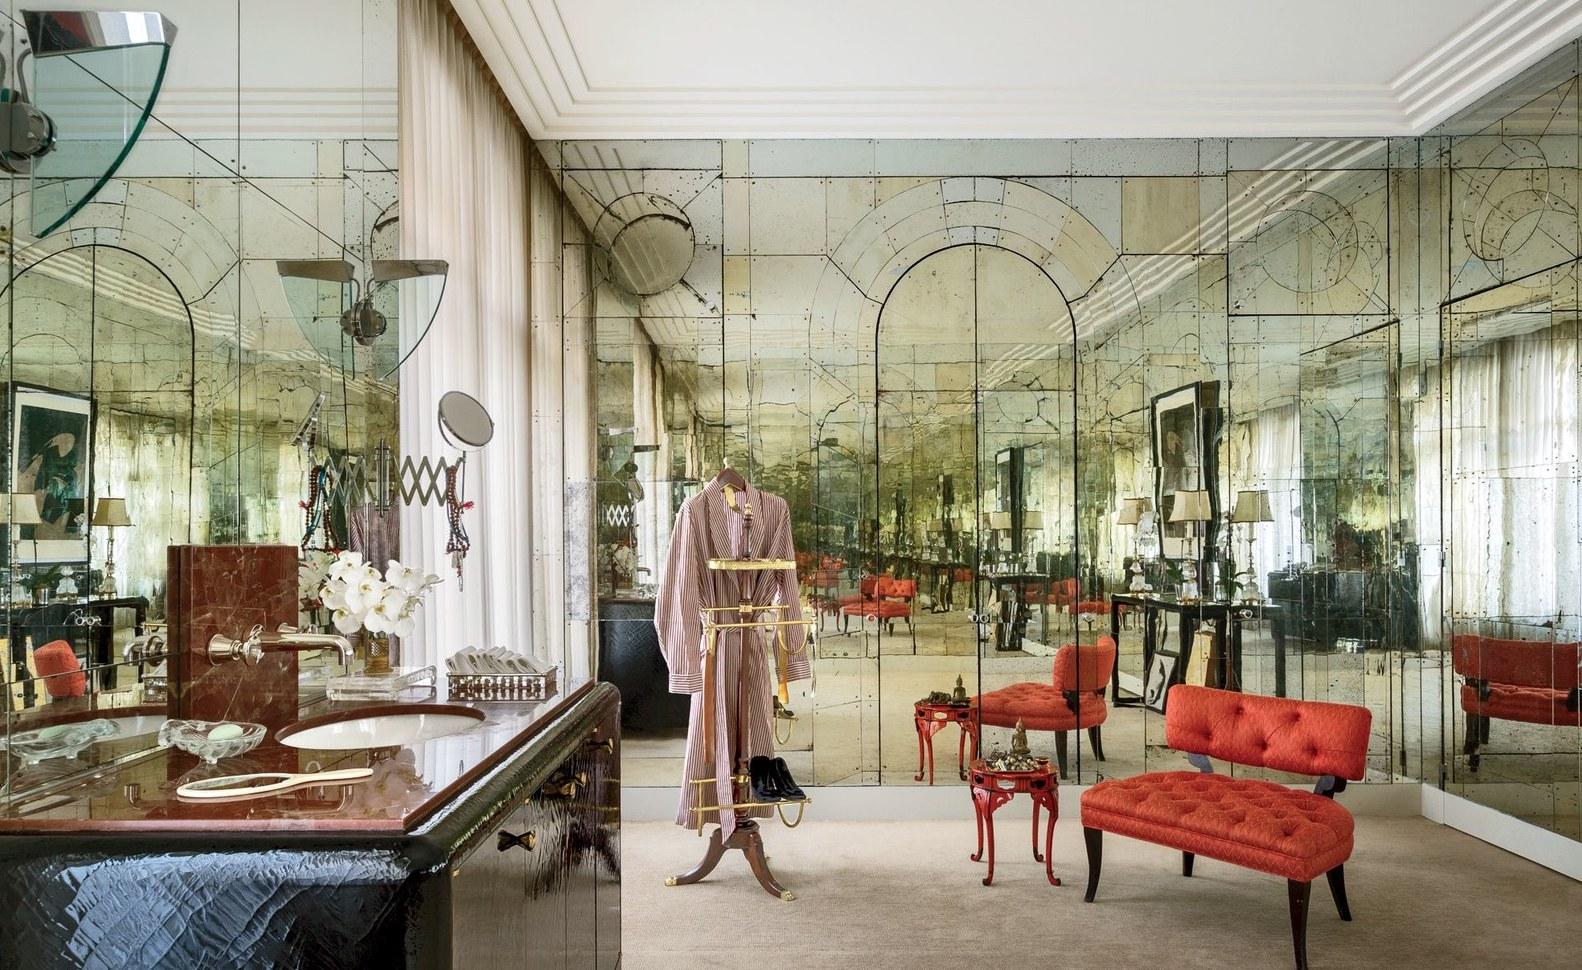 Art Deco Style Mirror - source: theartofbespoke.com